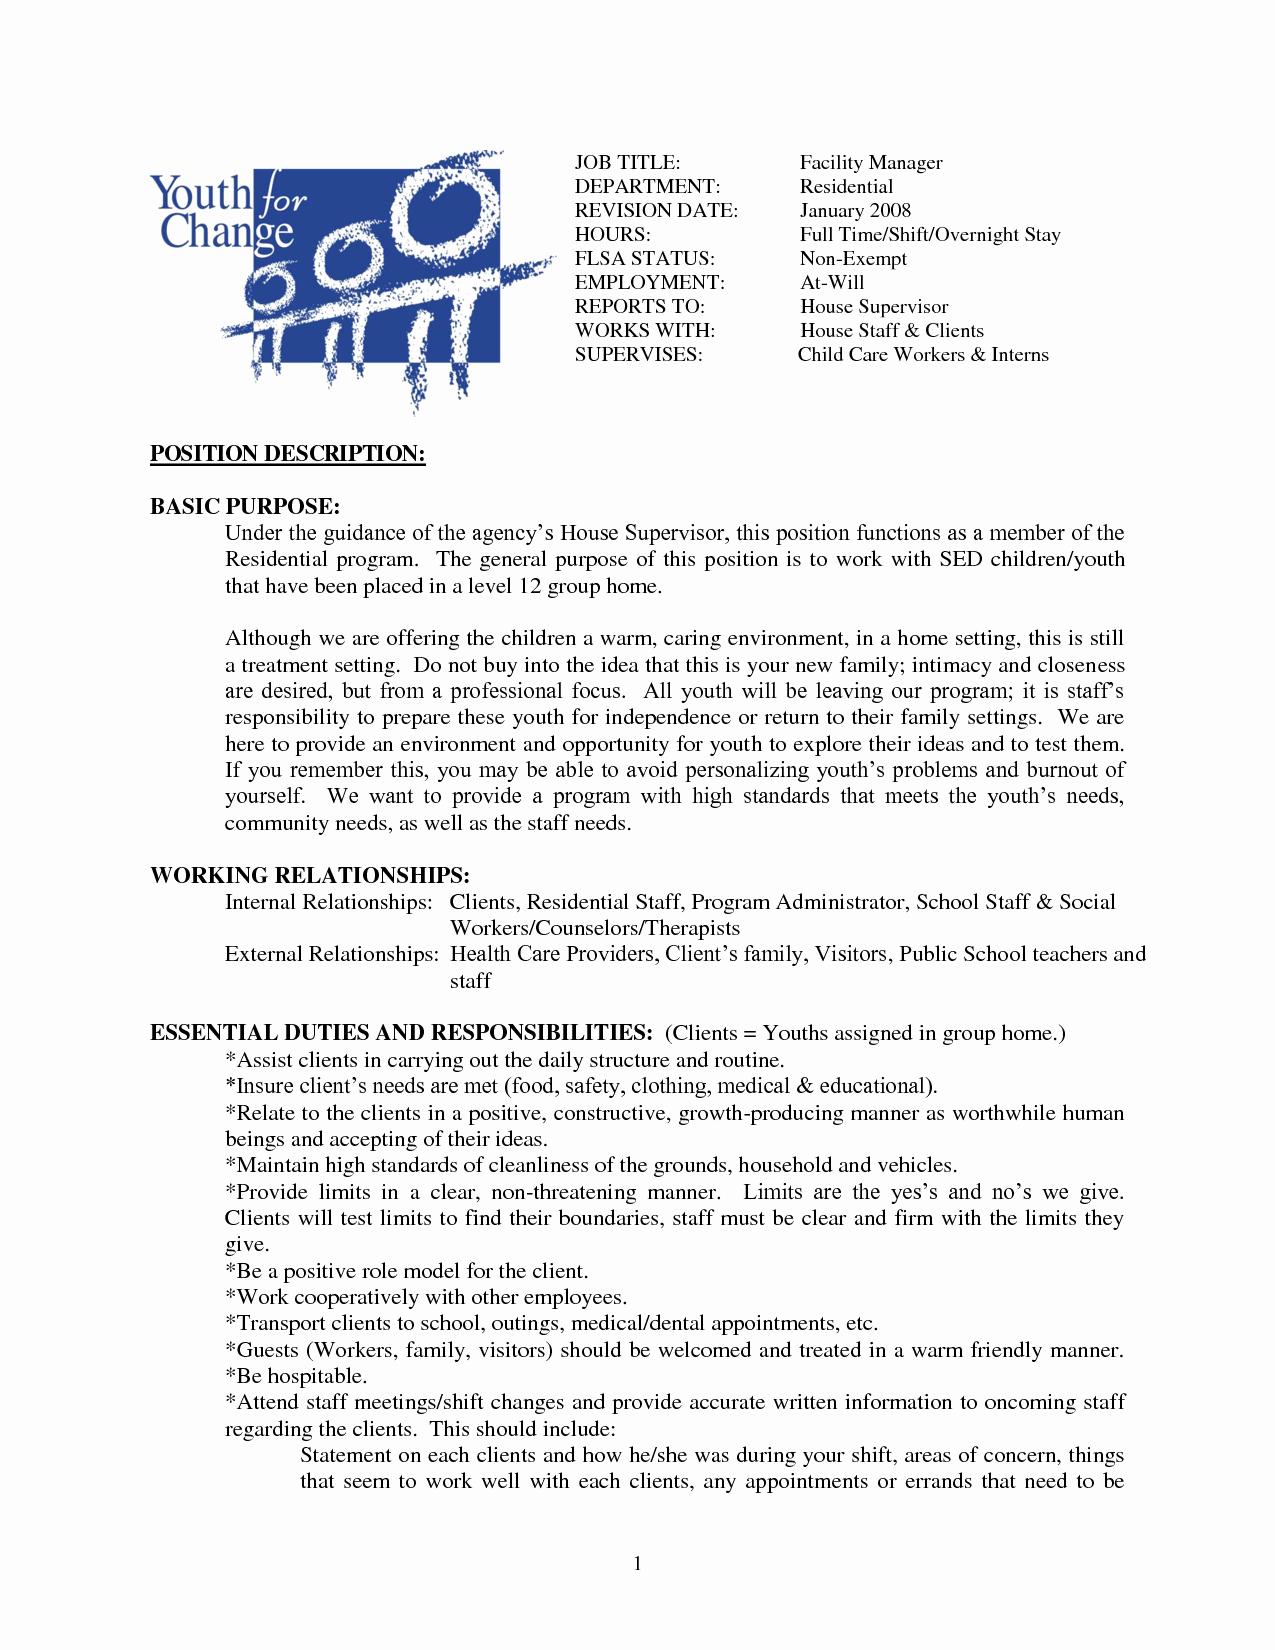 10 House Cleaning Resume Example Samplebusinessresume